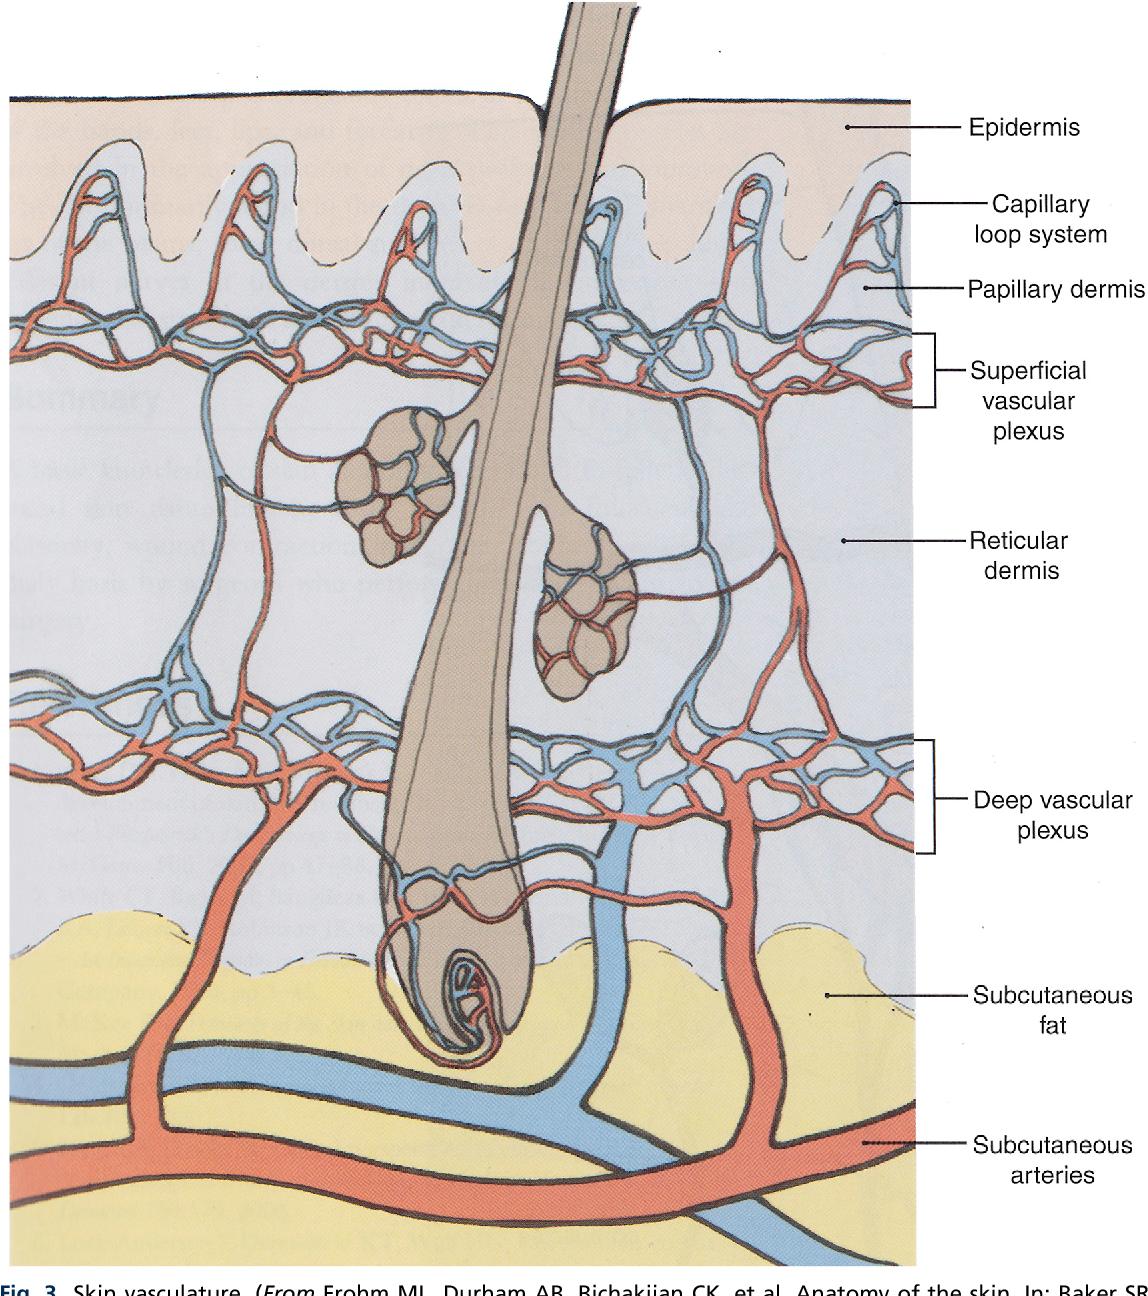 Anatomy Of The Skin And The Pathogenesis Of Nonmelanoma Skin Cancer